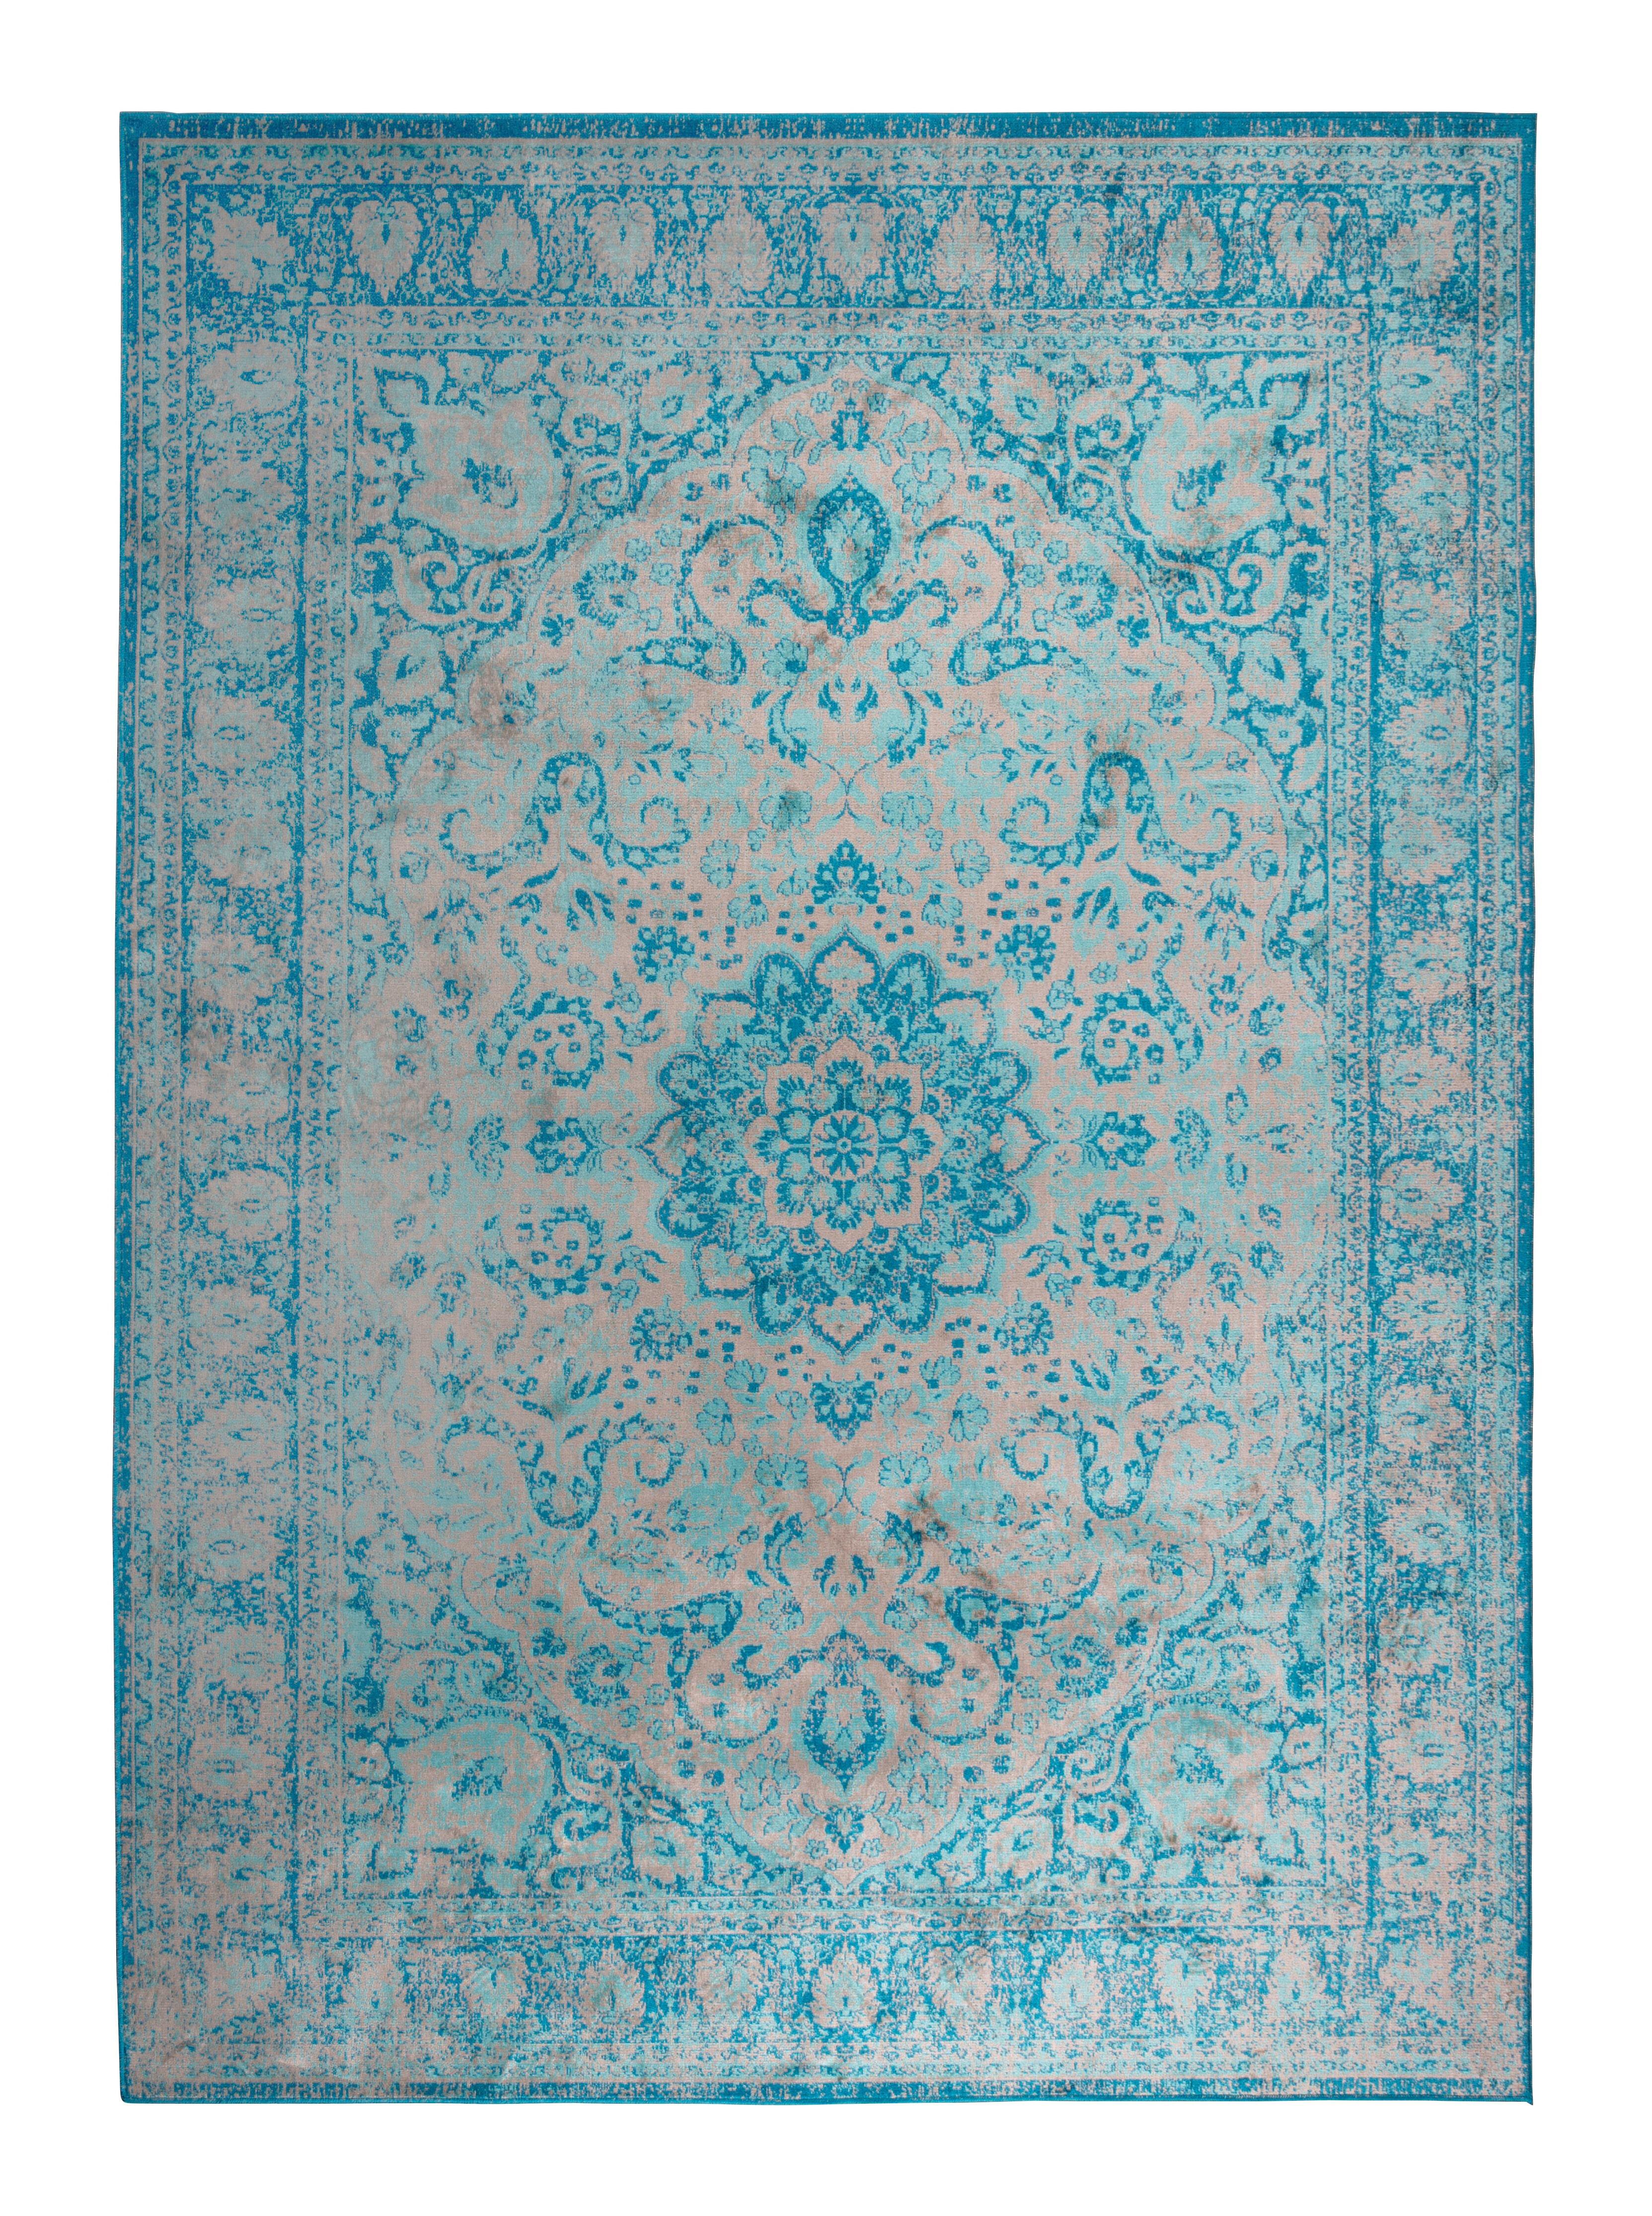 Vloerkleed 'Elian' 160 x 230cm, kleur Blauw